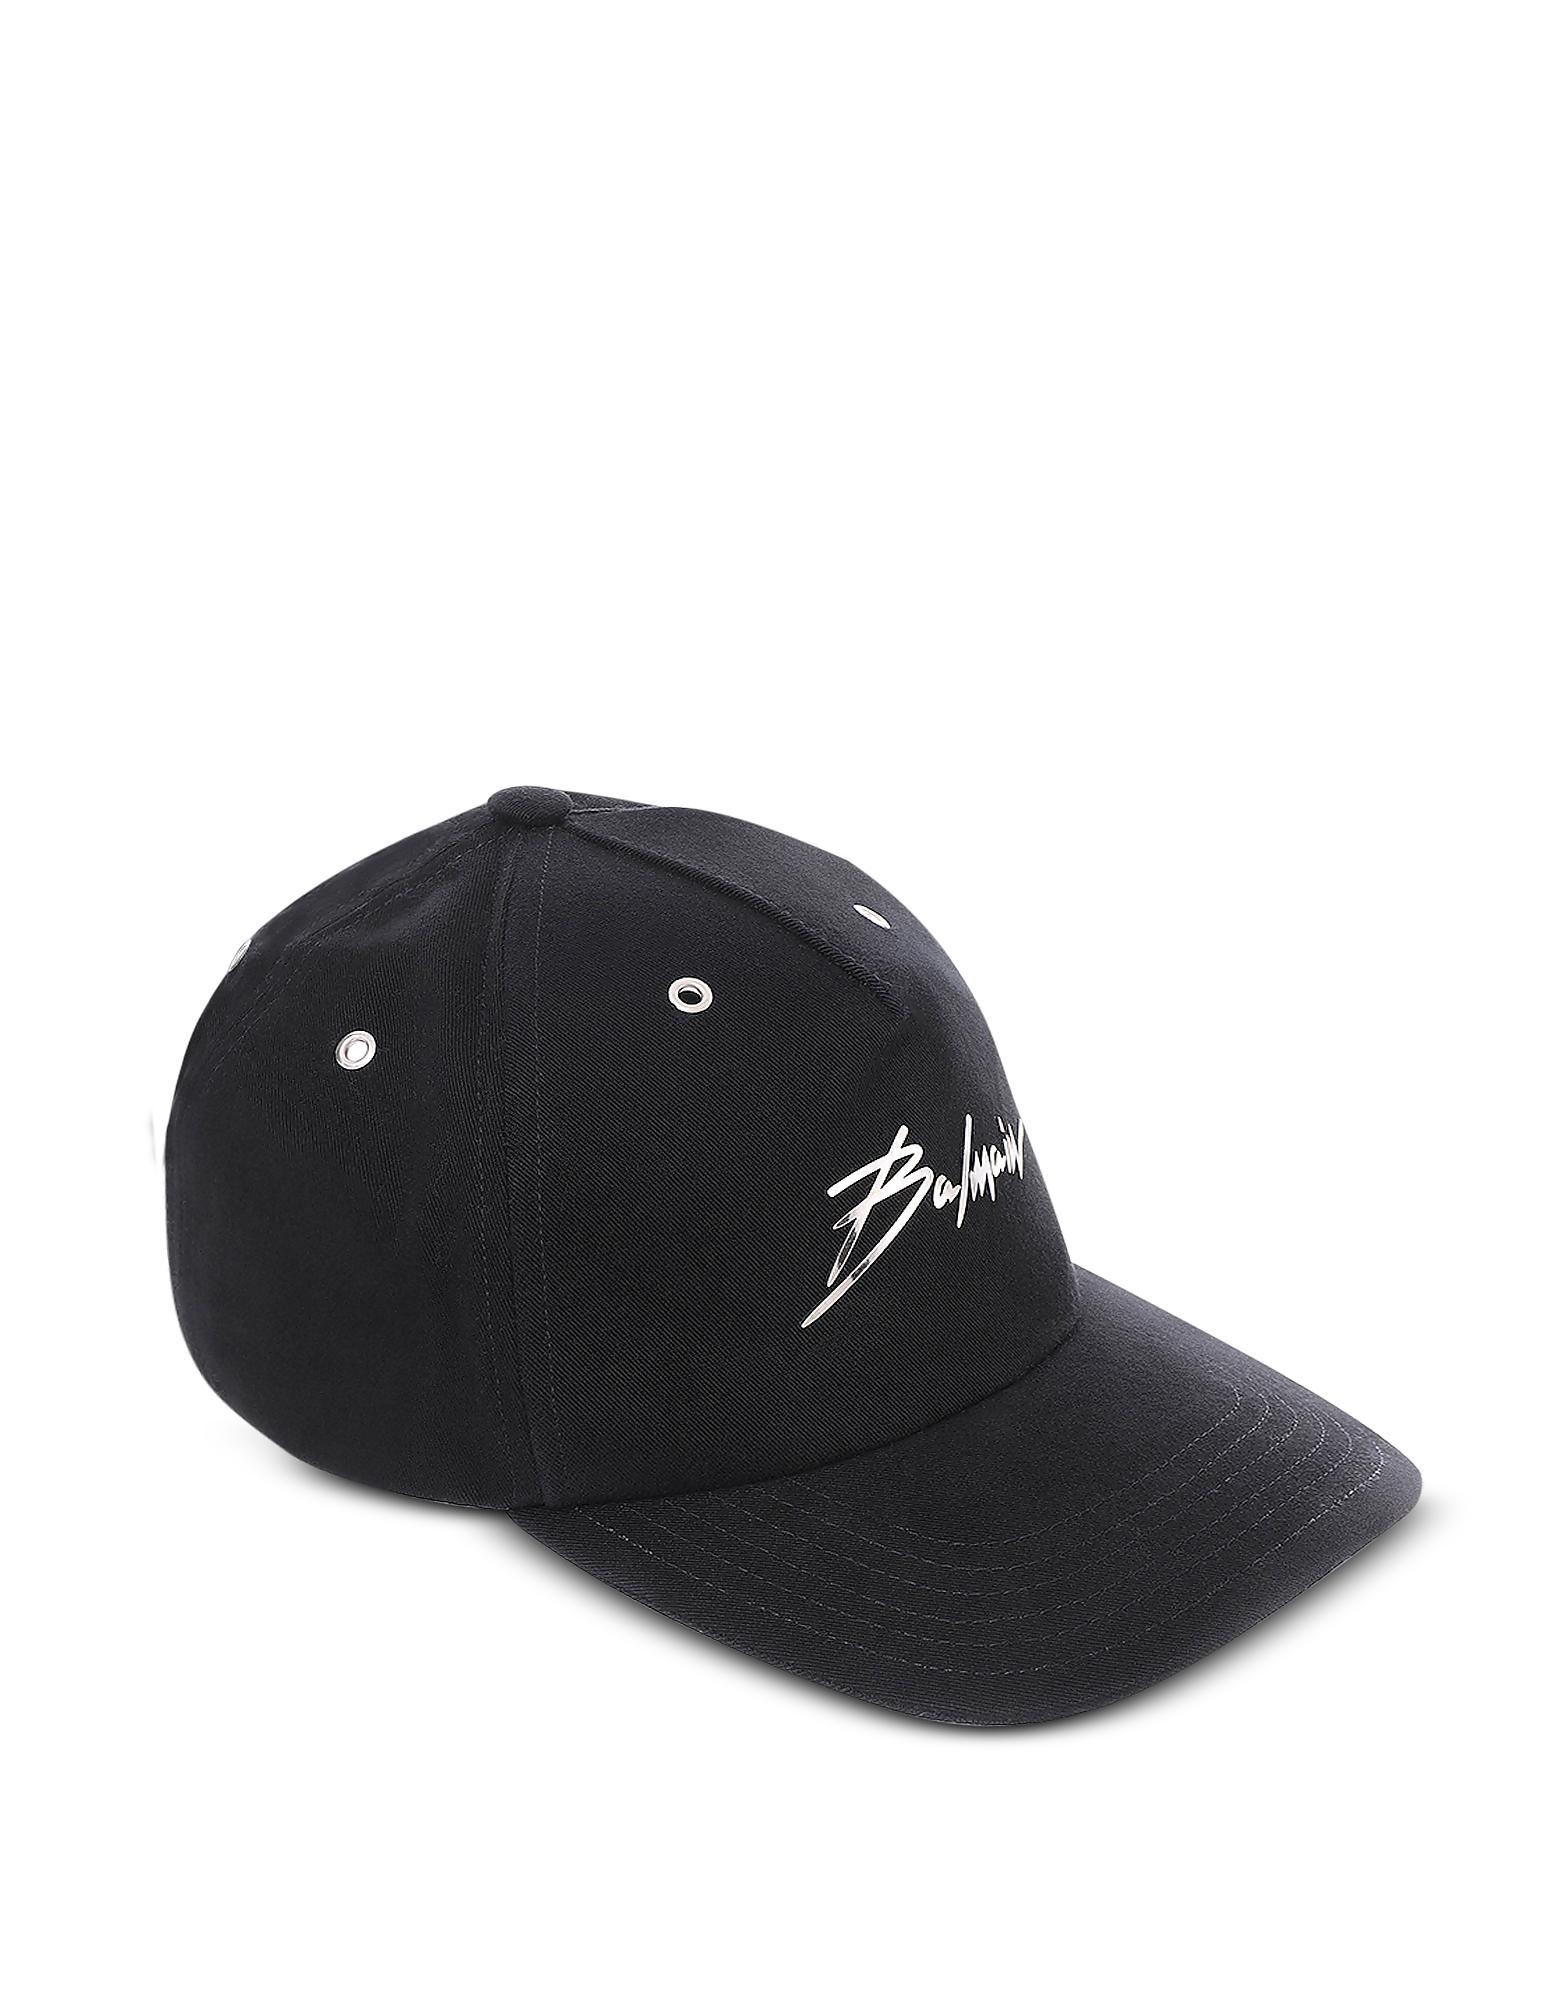 Cotton Signature Baseball Cap